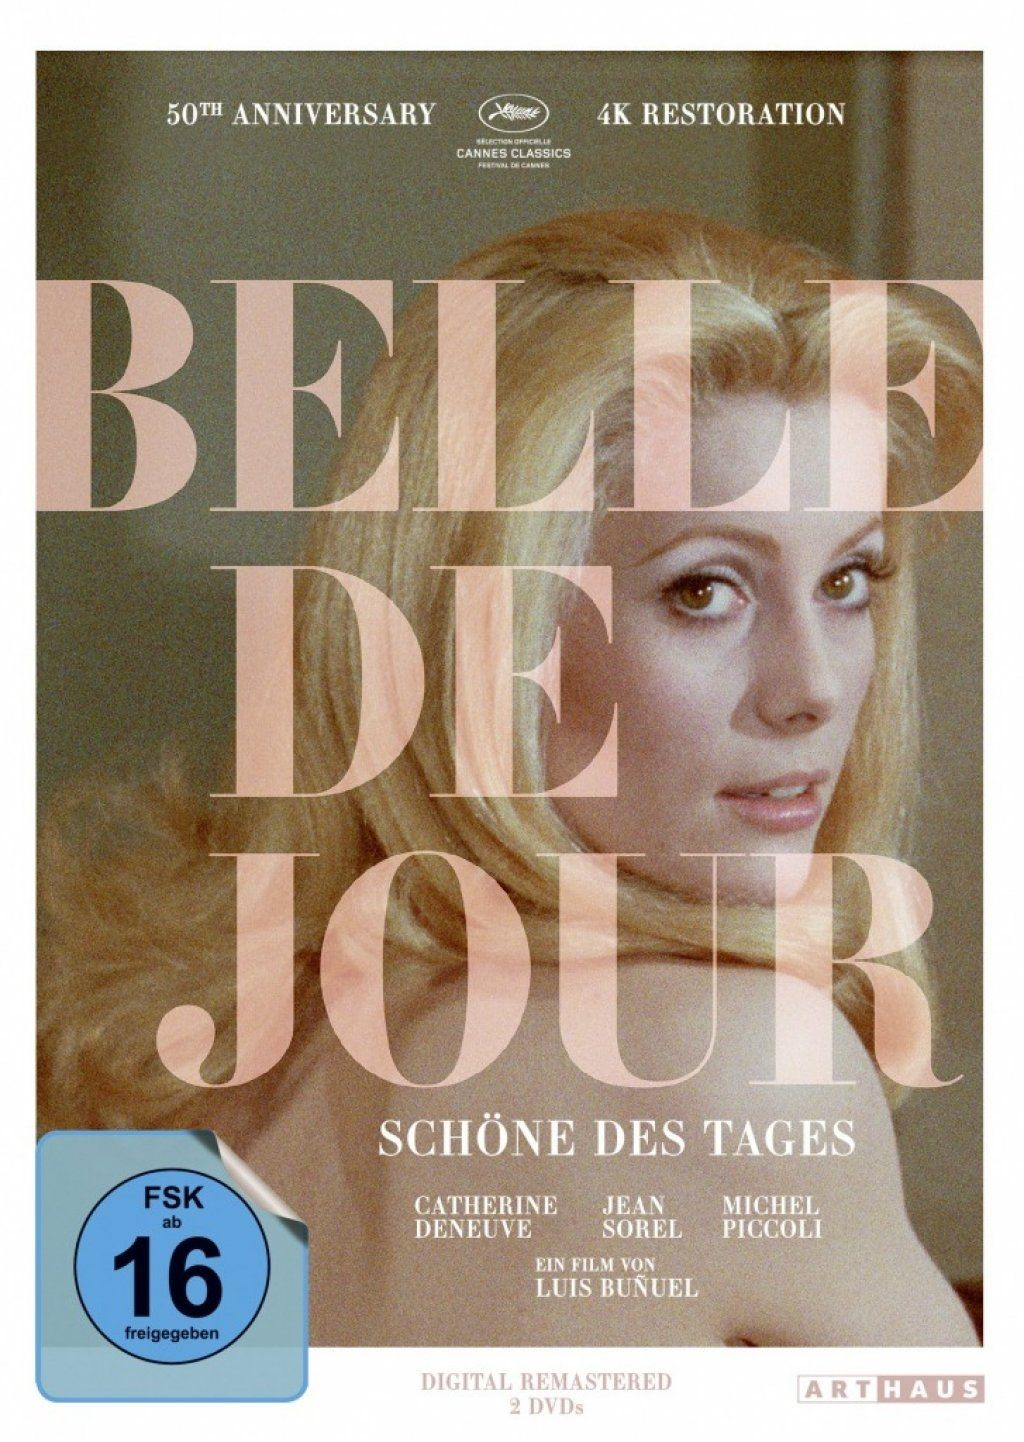 Belle de Jour - Schöne des Tages (50th Anniversary Edition) (Digital Remastered) (2 Discs)